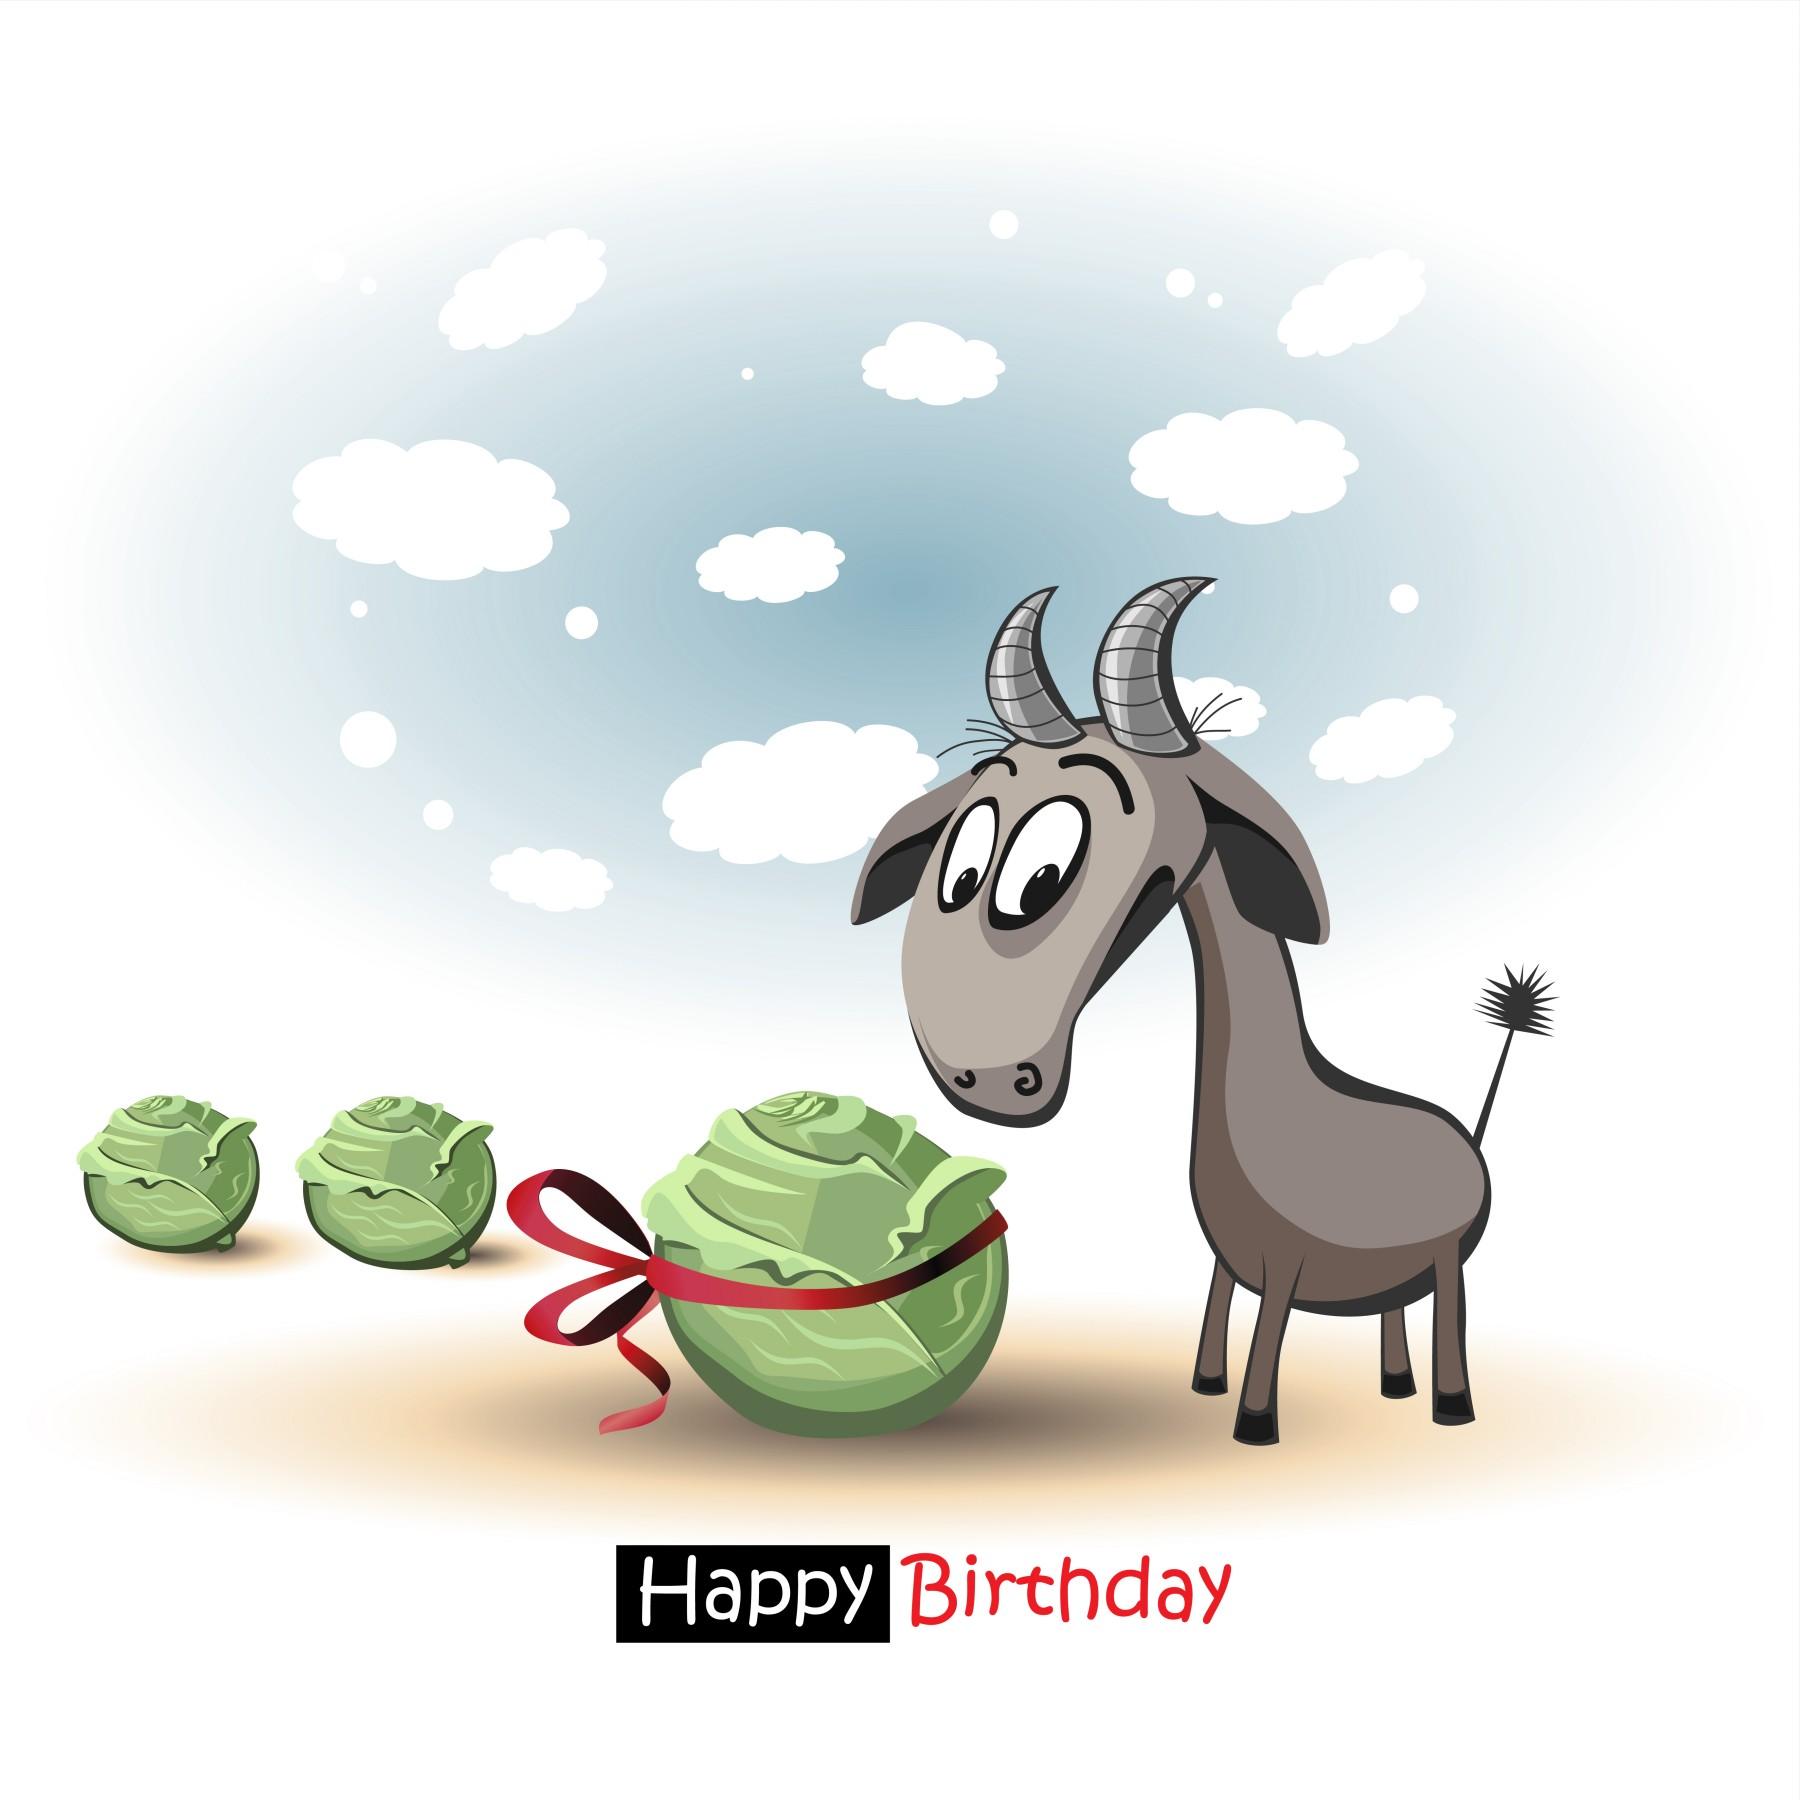 25 Happy Birthday Creative Funny Greeting Cards Elsoar – Goat Birthday Card